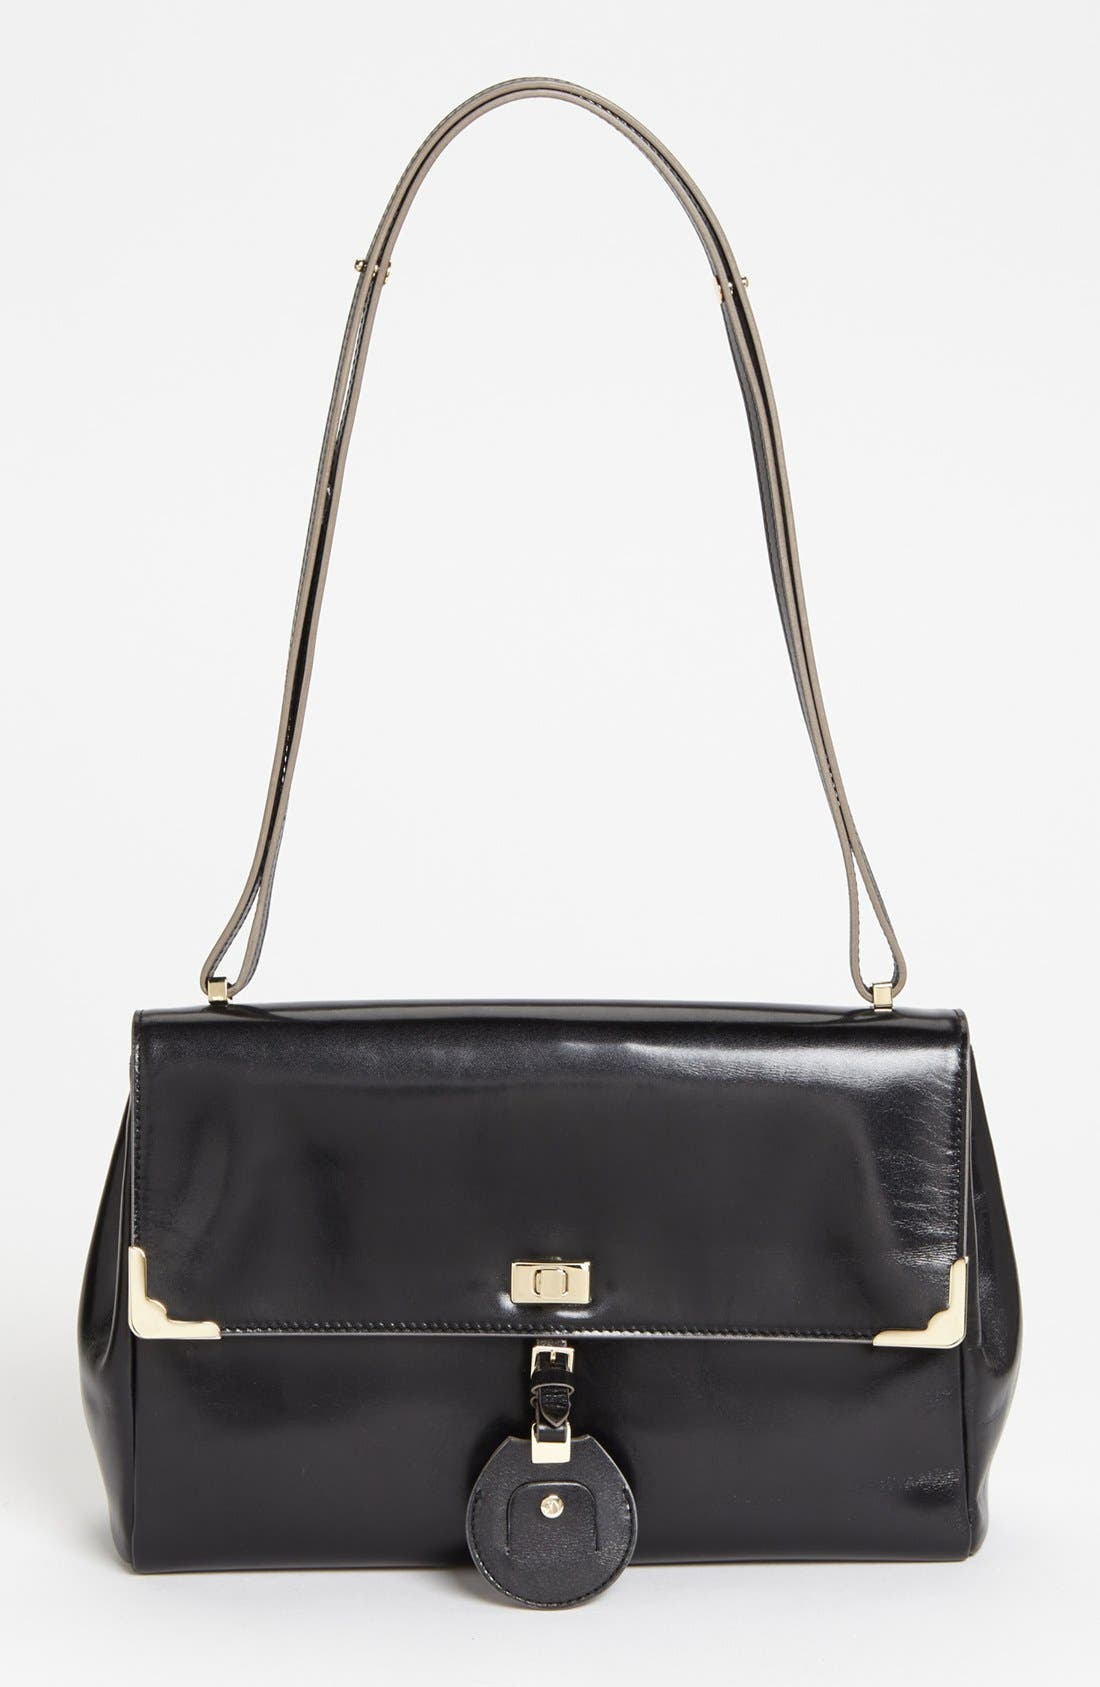 Alternate Image 1 Selected - Jason Wu 'Jourdan 2' Leather Shoulder Bag